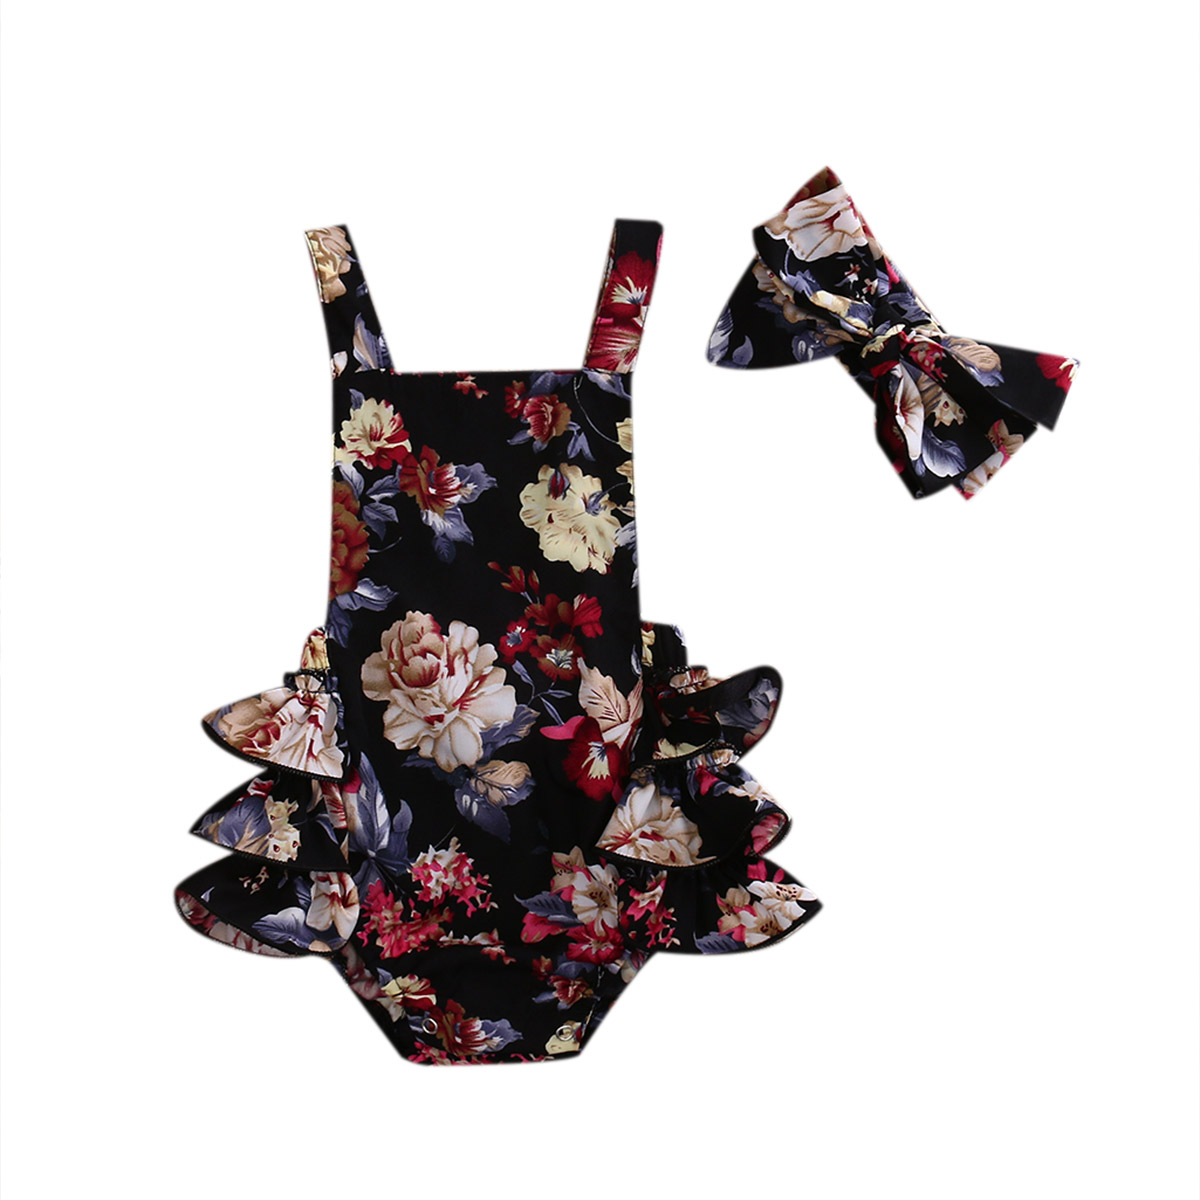 Summer Girls Clothing Sets Cotton Kids Bodysuit Clothes Flower Baby playsuit +Hairband infantis menina Children Costume 2pcs